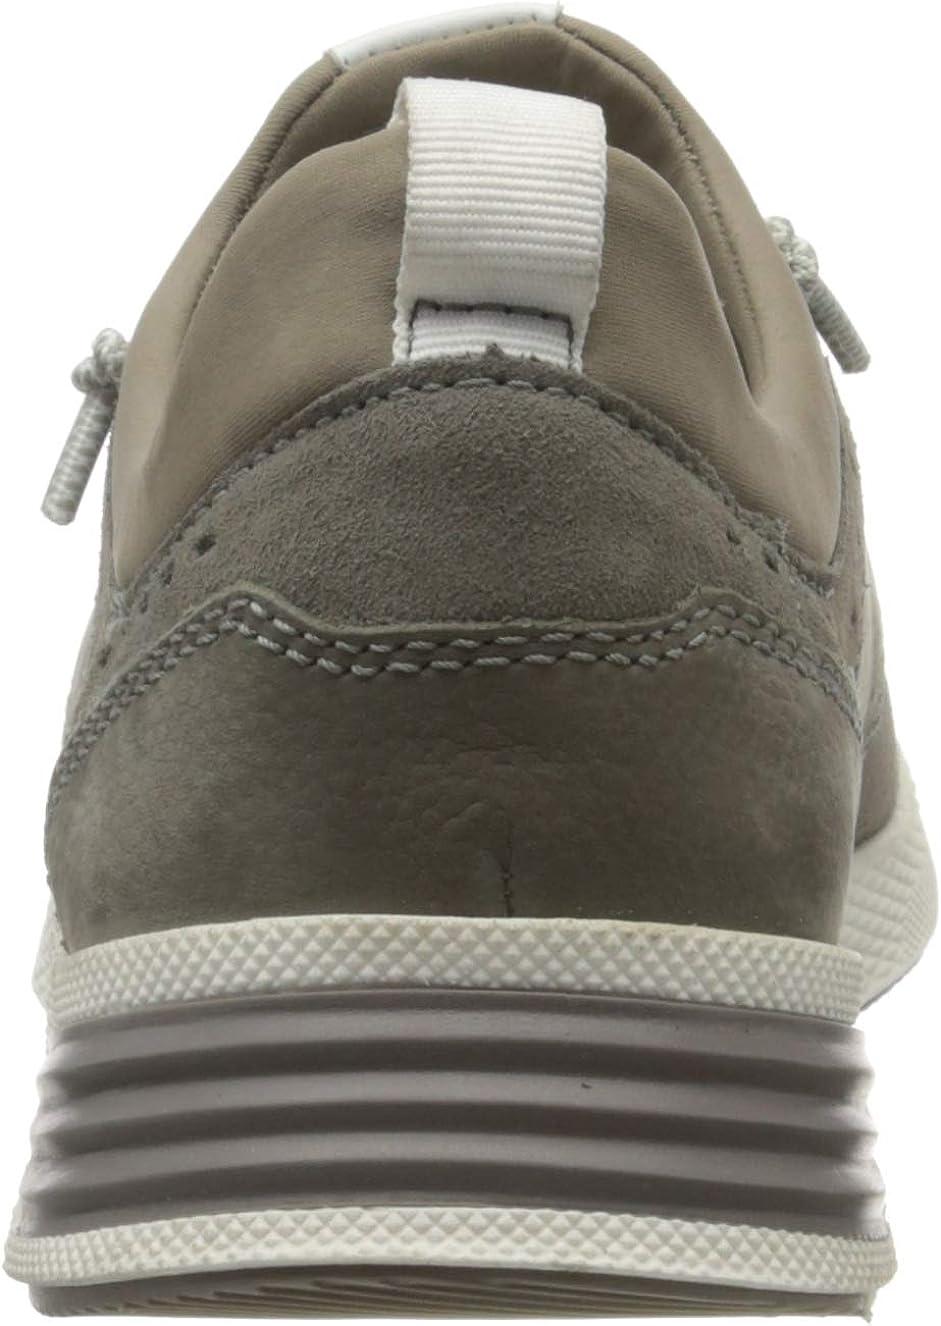 Sioux Herren Grash-h201-47 Sneaker Grau Piombo 002